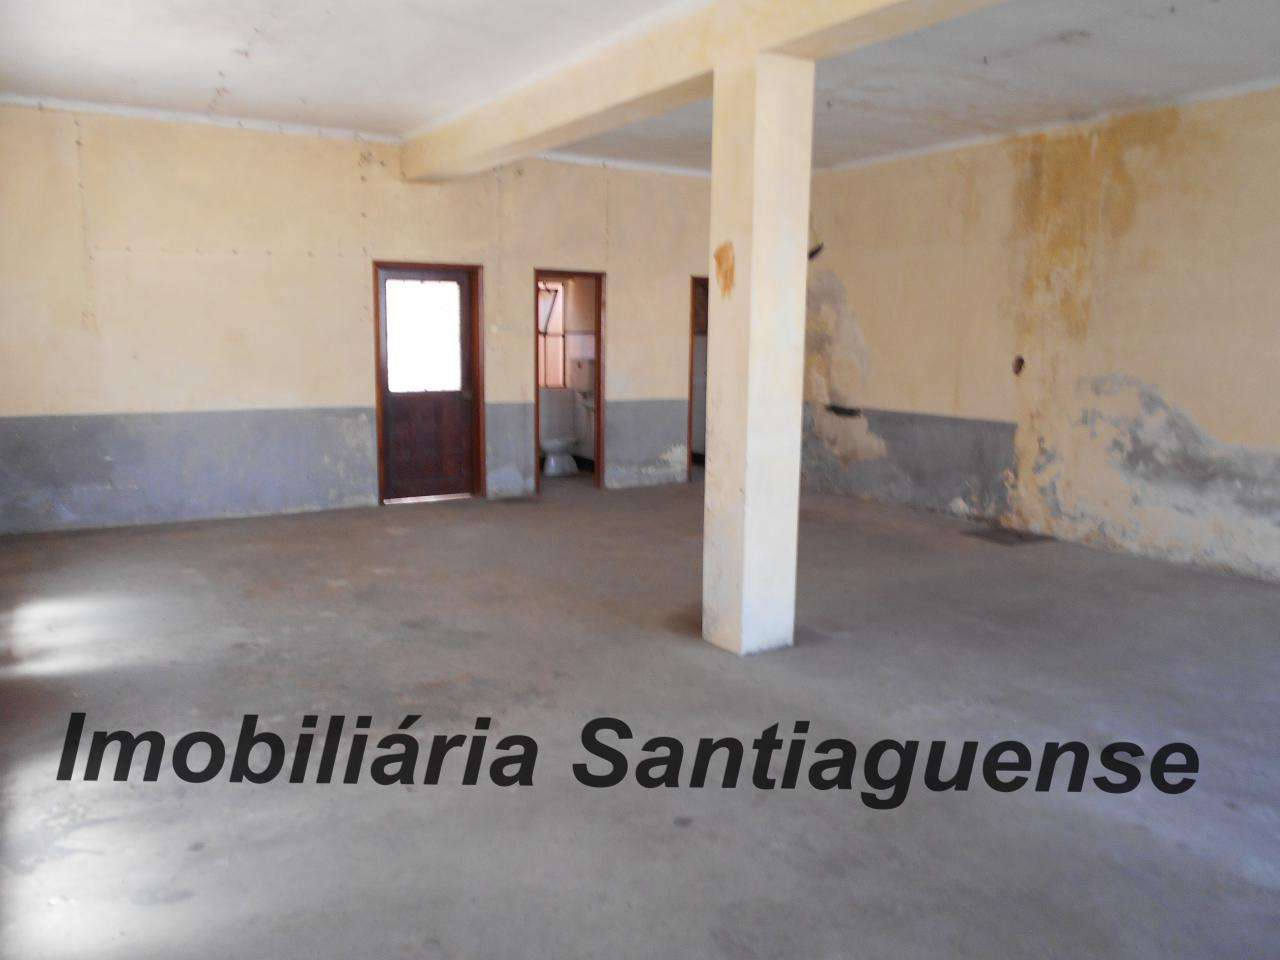 Loja para arrendar, Oliveira de Azeméis, Santiago de Riba-Ul, Ul, Macinhata da Seixa e Madail, Oliveira de Azeméis, Aveiro - Foto 3